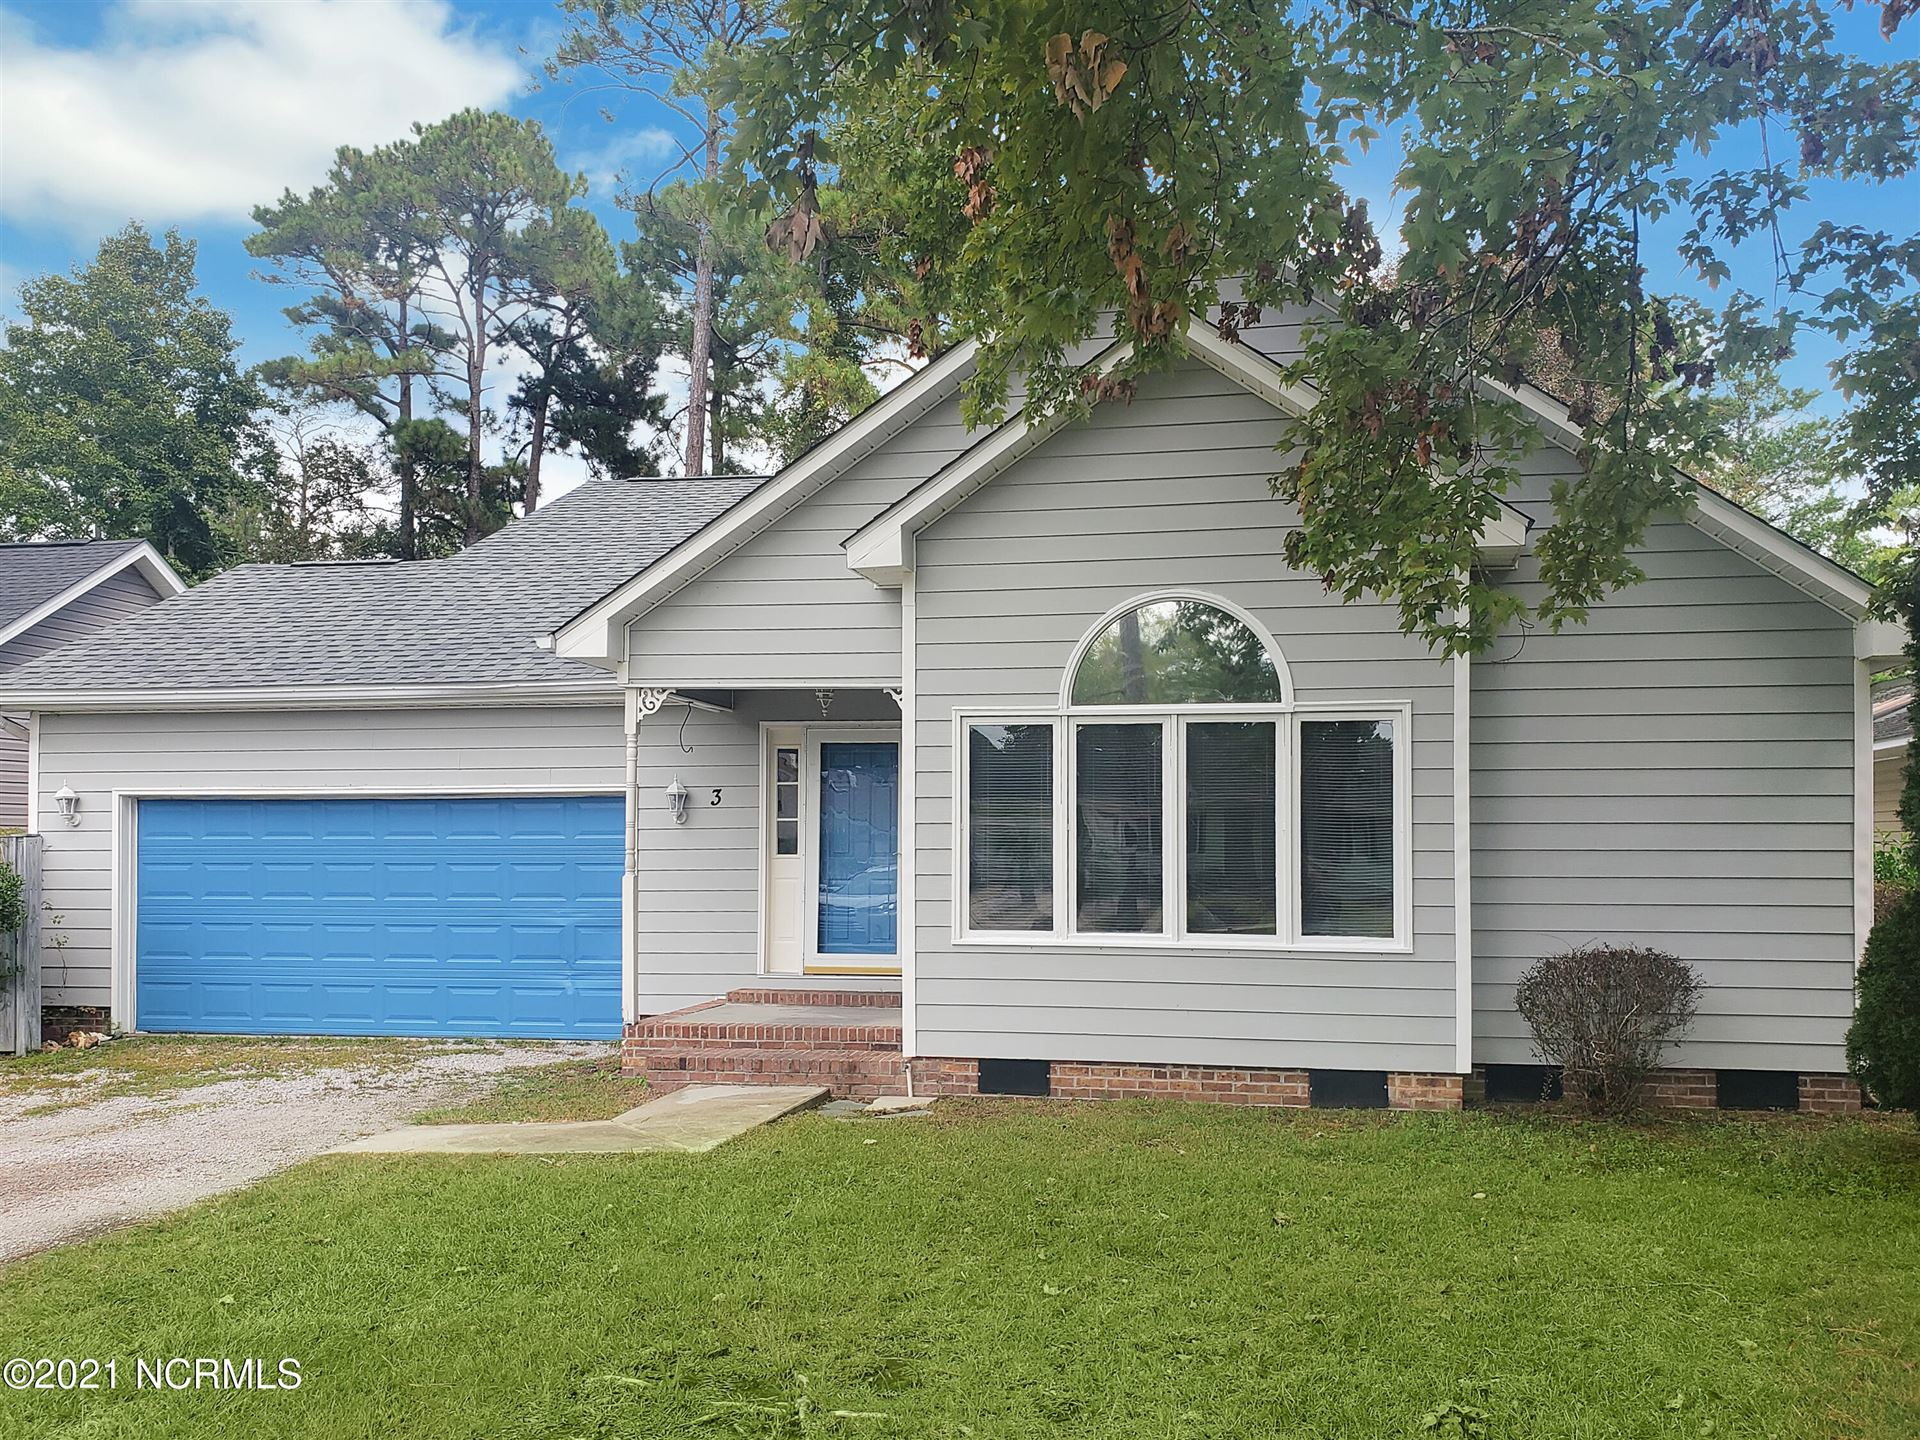 Photo of 3 Court 9 Northwest Drive, Carolina Shores, NC 28467 (MLS # 100293869)